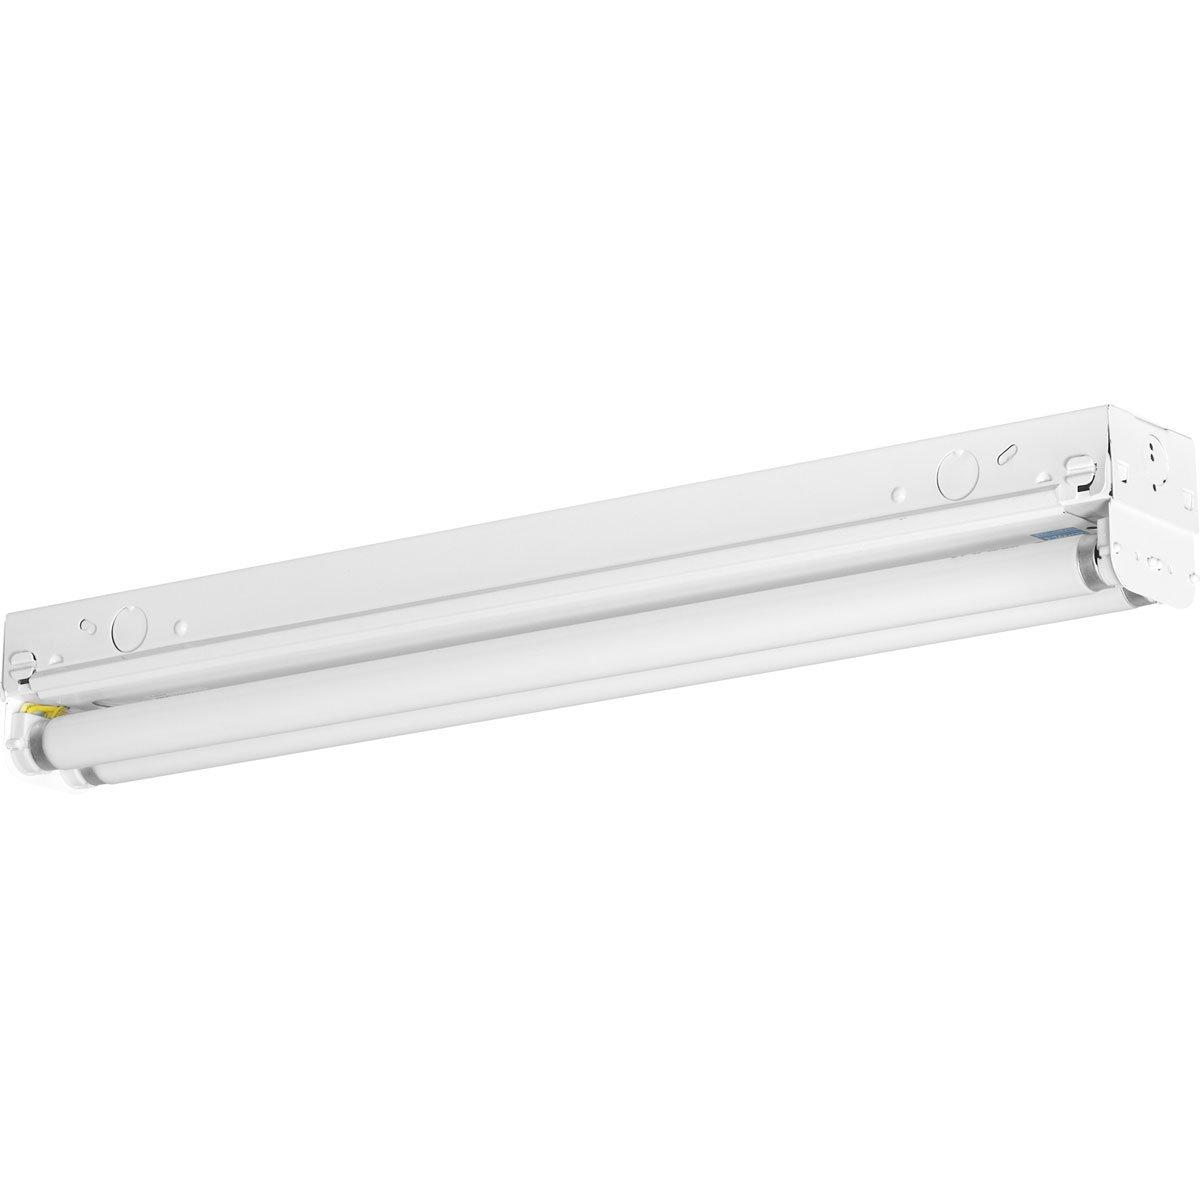 Progress Lighting P7266-30EB Fluorescent Strip Lights 120 Volt Normal Power Factor Electronic Ballast, White